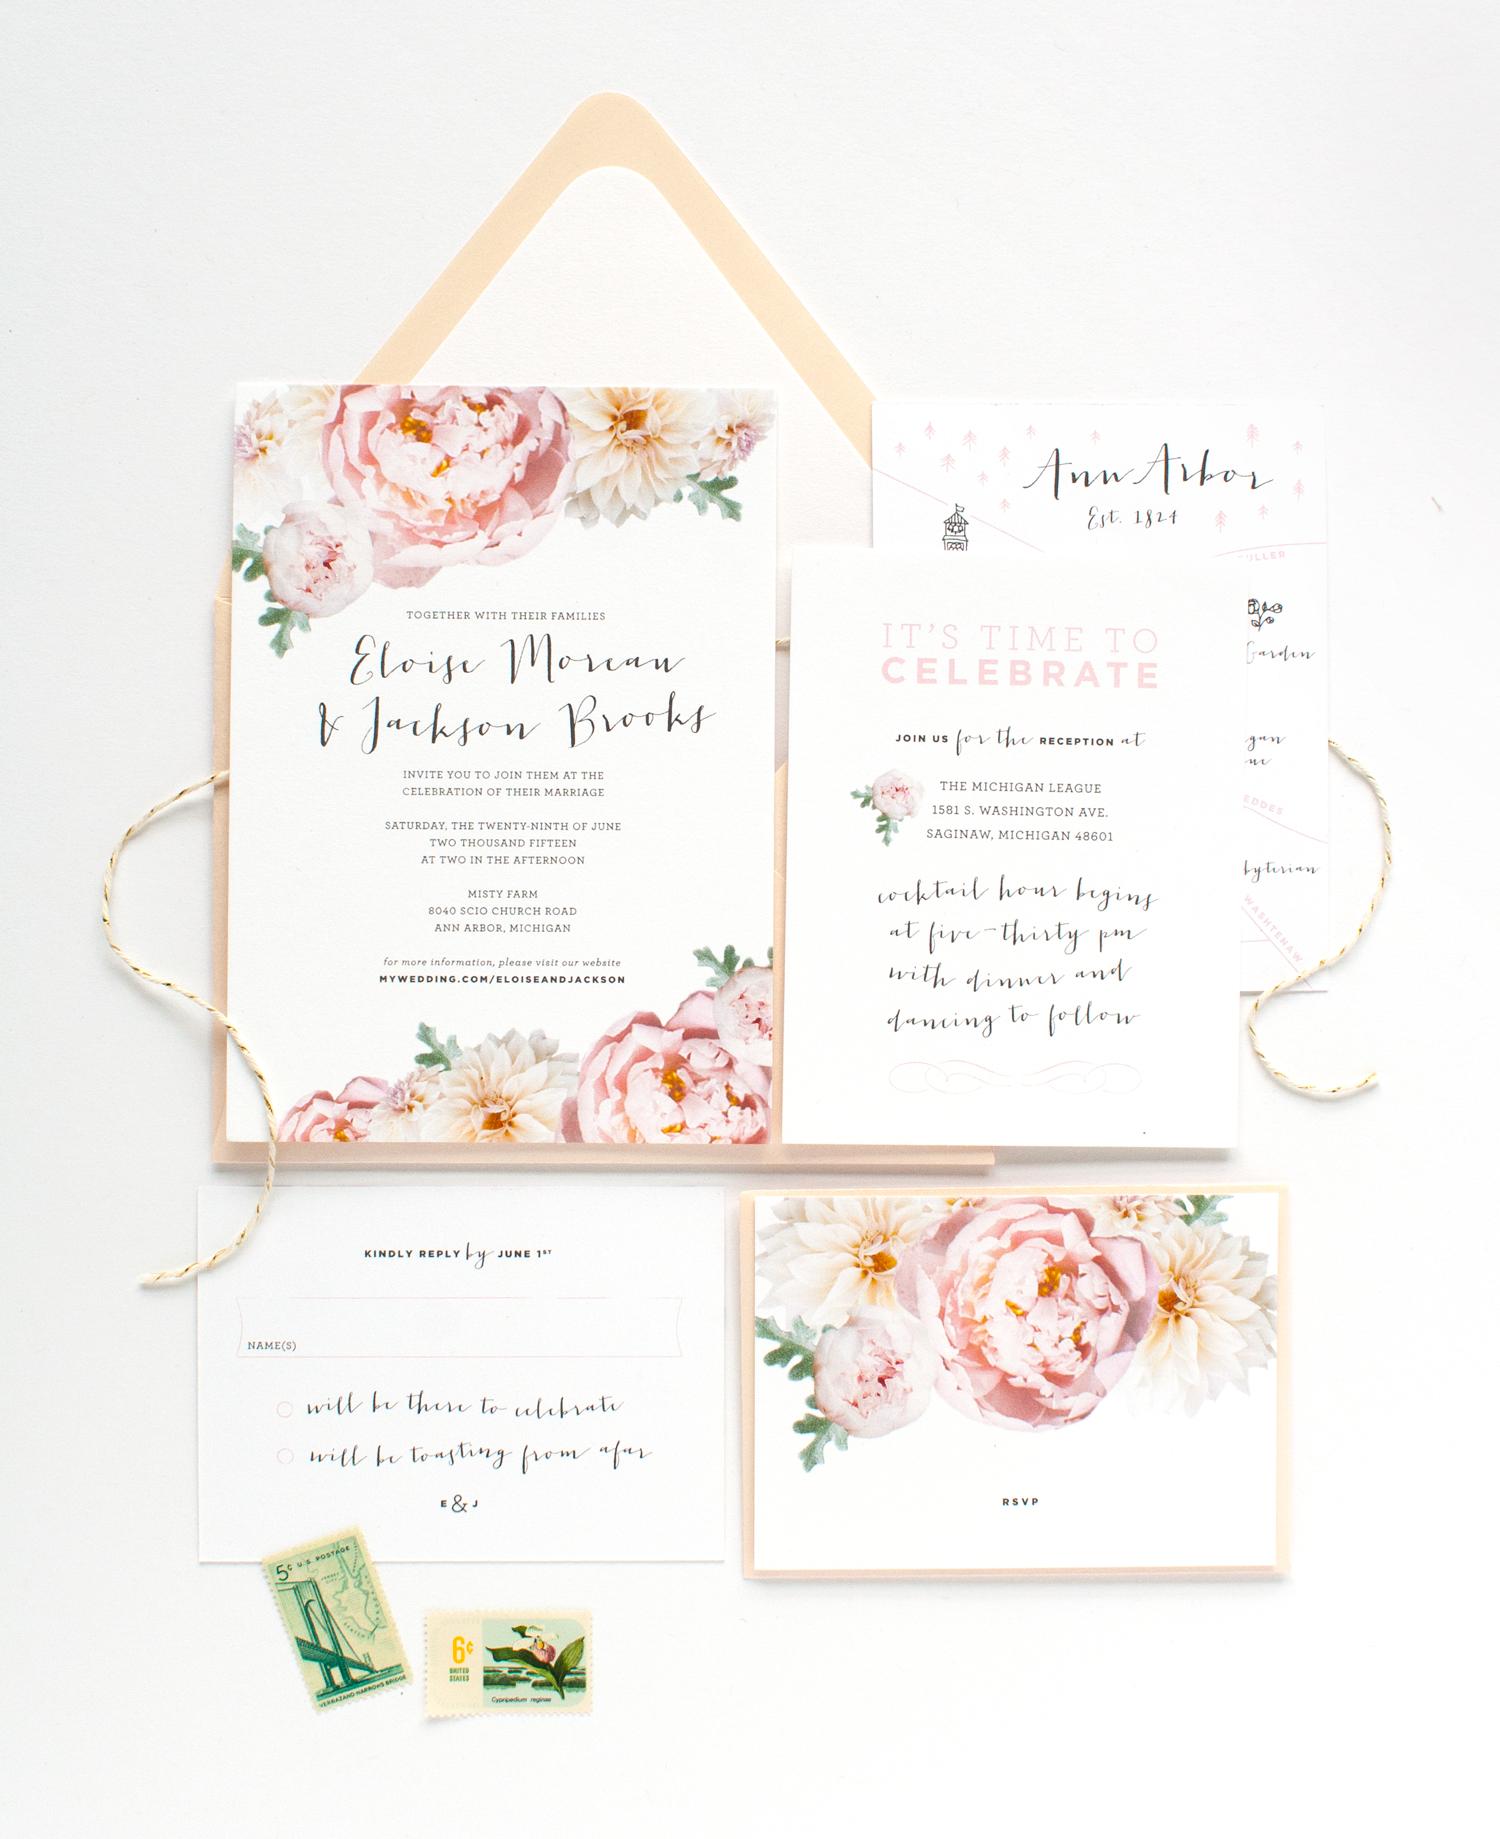 Blush Peony Wedding Invitation Suite | Blush peonies, Peony and Weddings